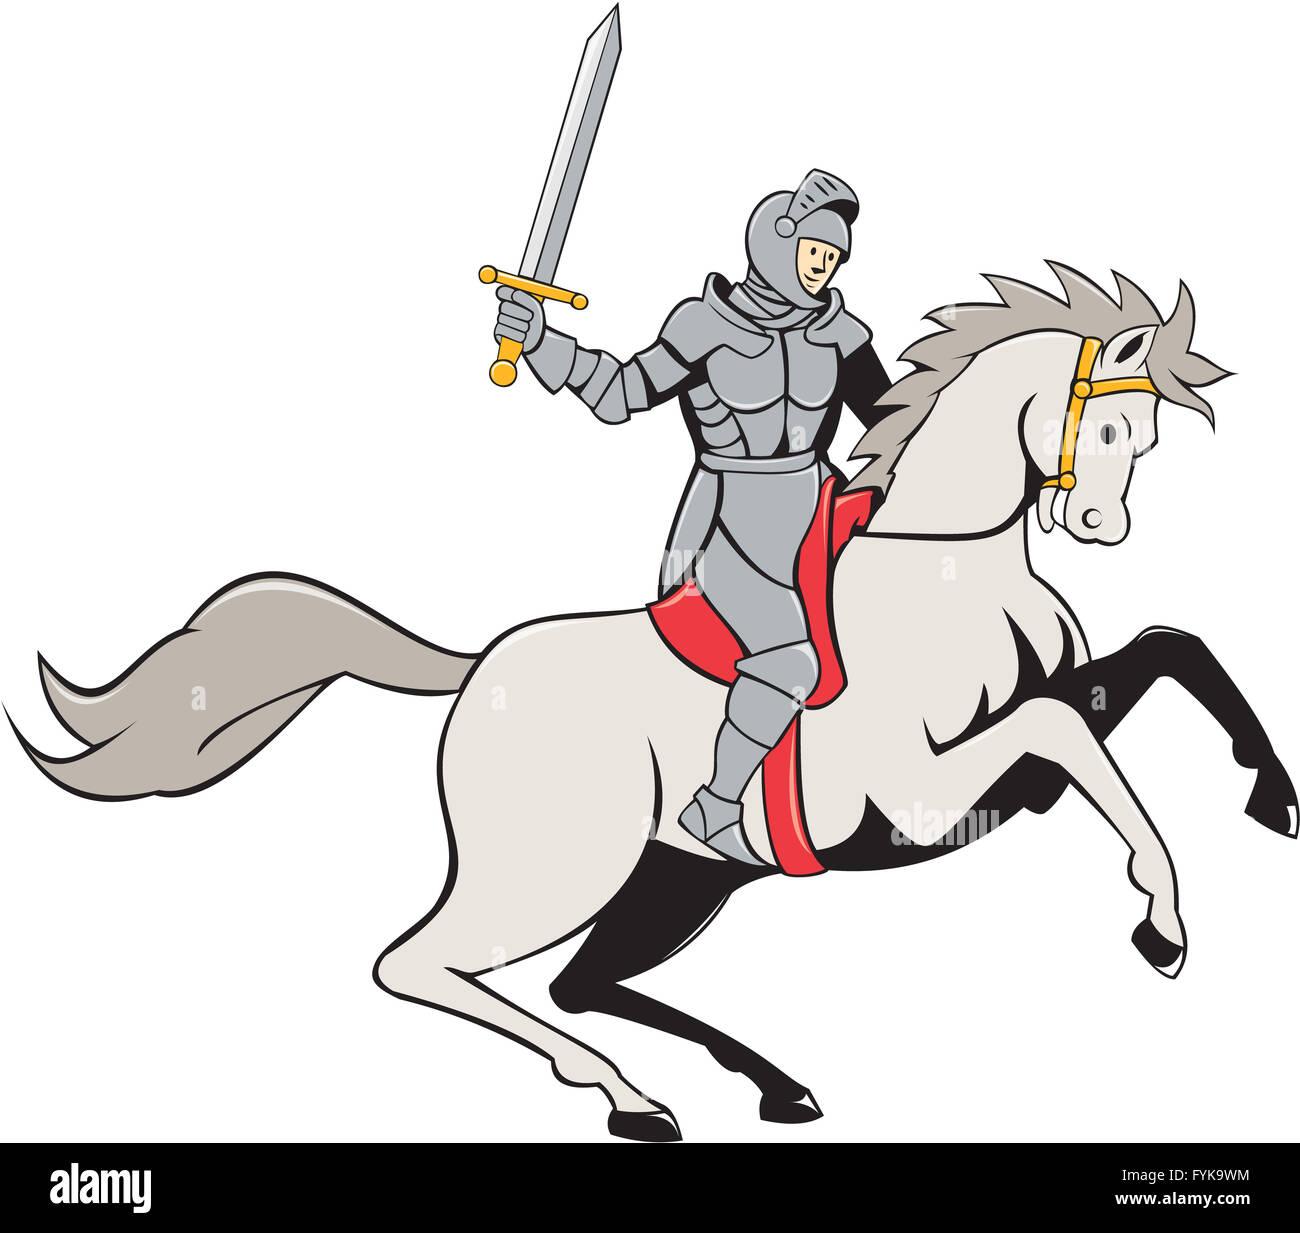 Knight Riding Horse Sword Cartoon - Stock Image